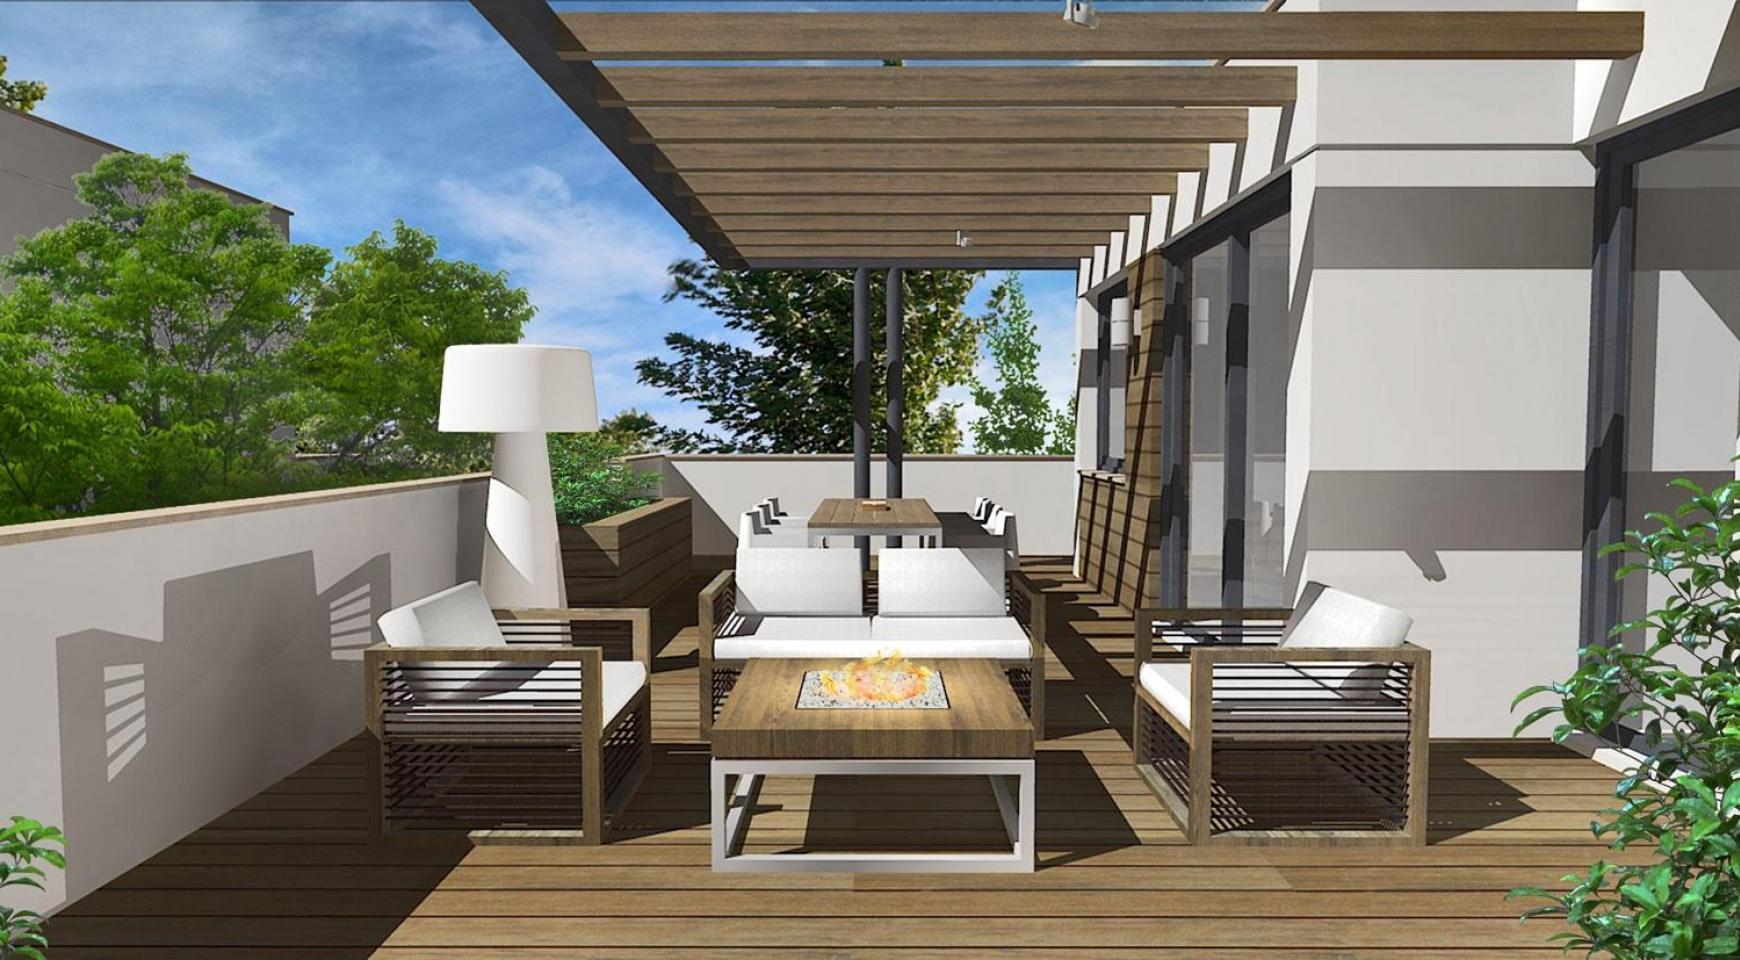 Spacious 4 Bedroom Villa in a New Complex in Agios Athanasios - 3